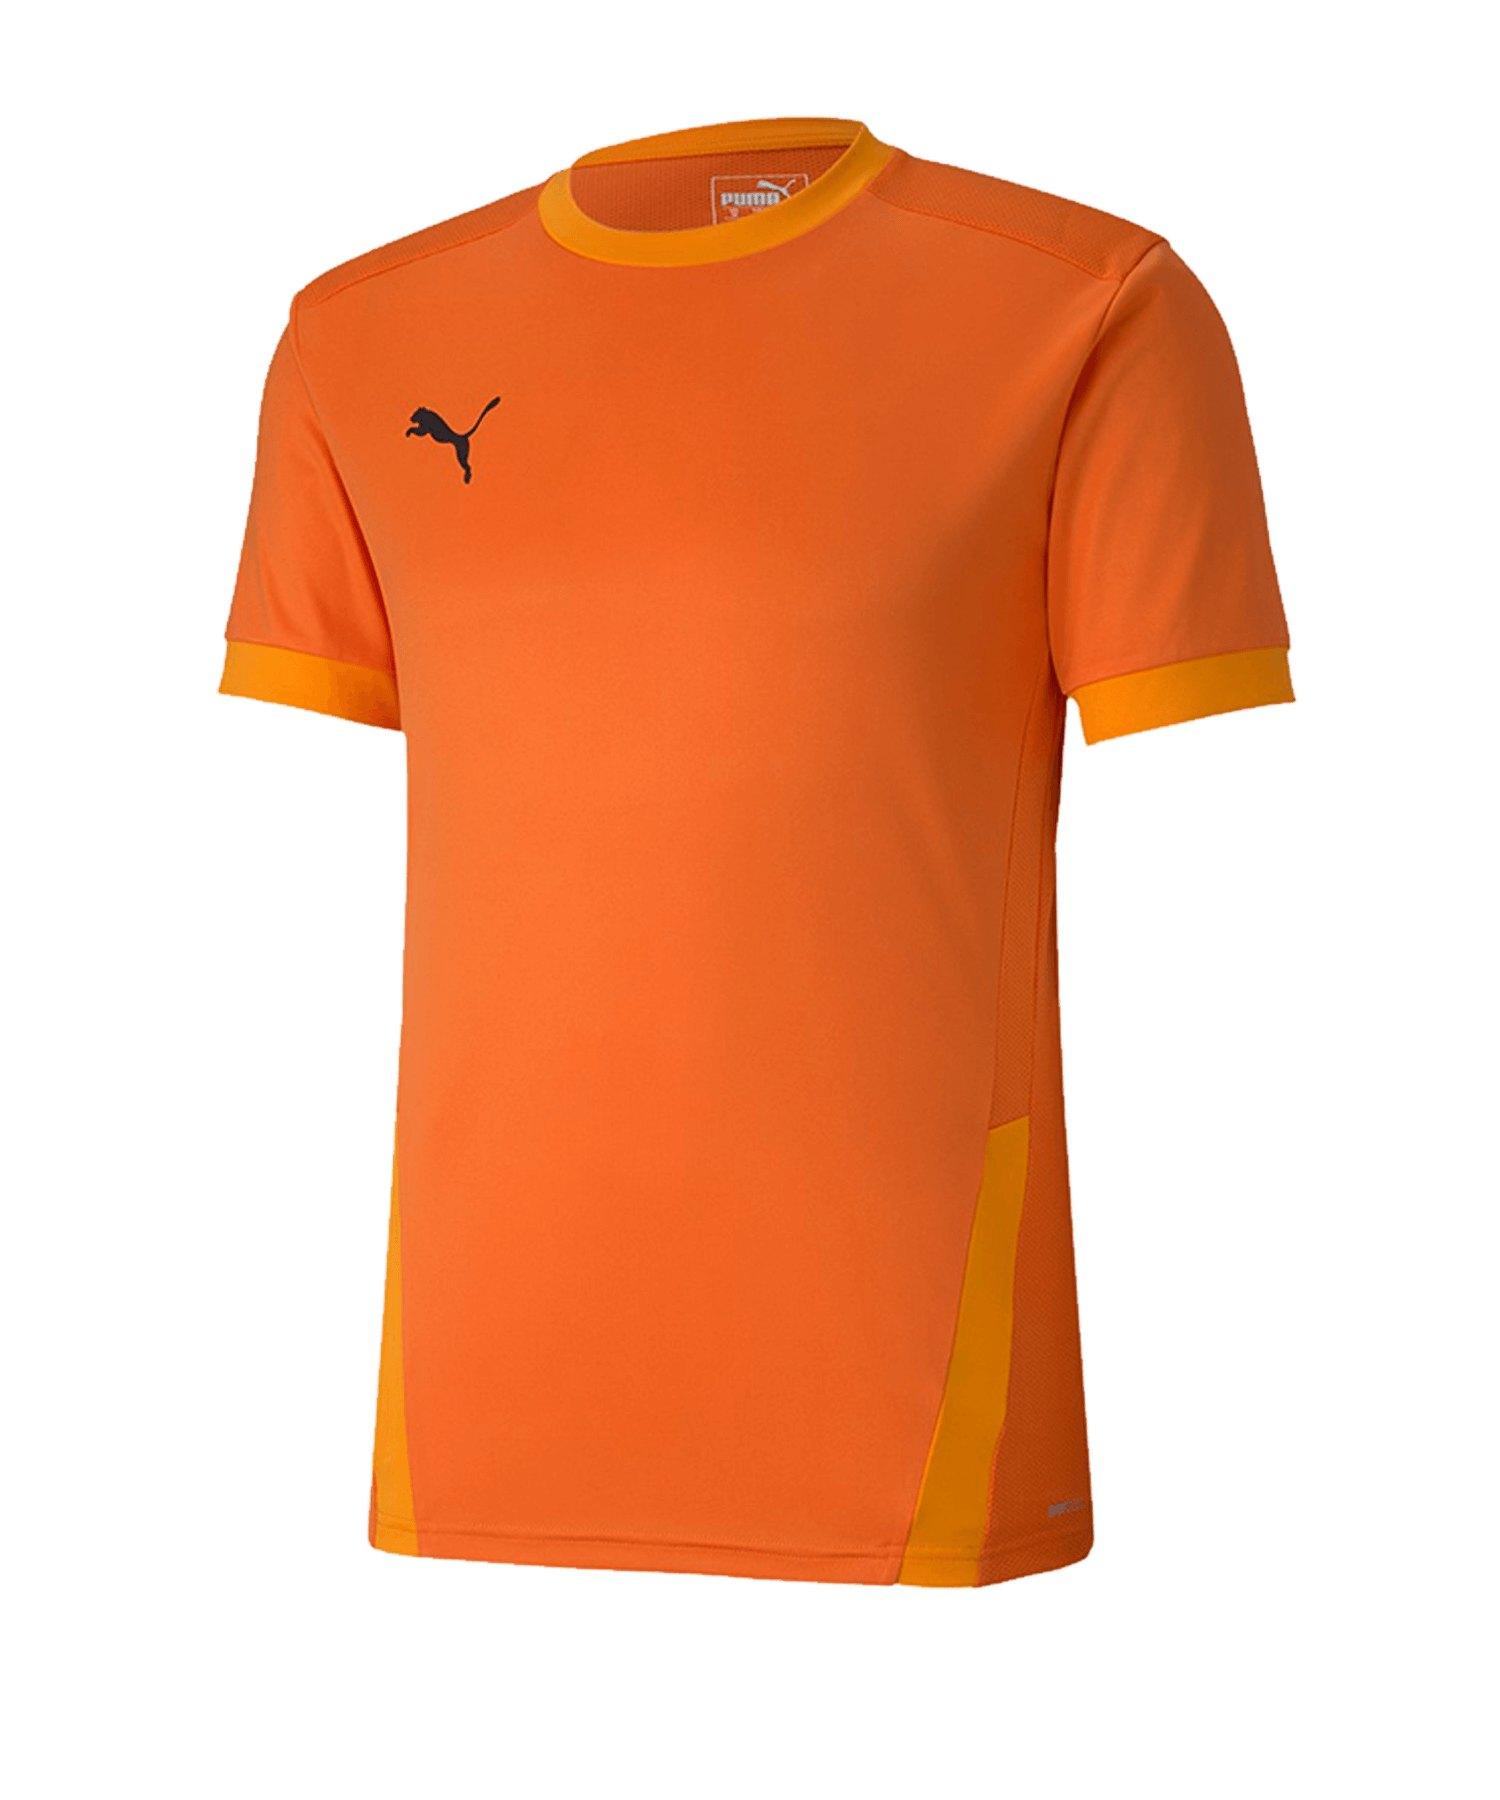 PUMA teamGOAL 23 Trikot kurzarm Orange F08 - orange